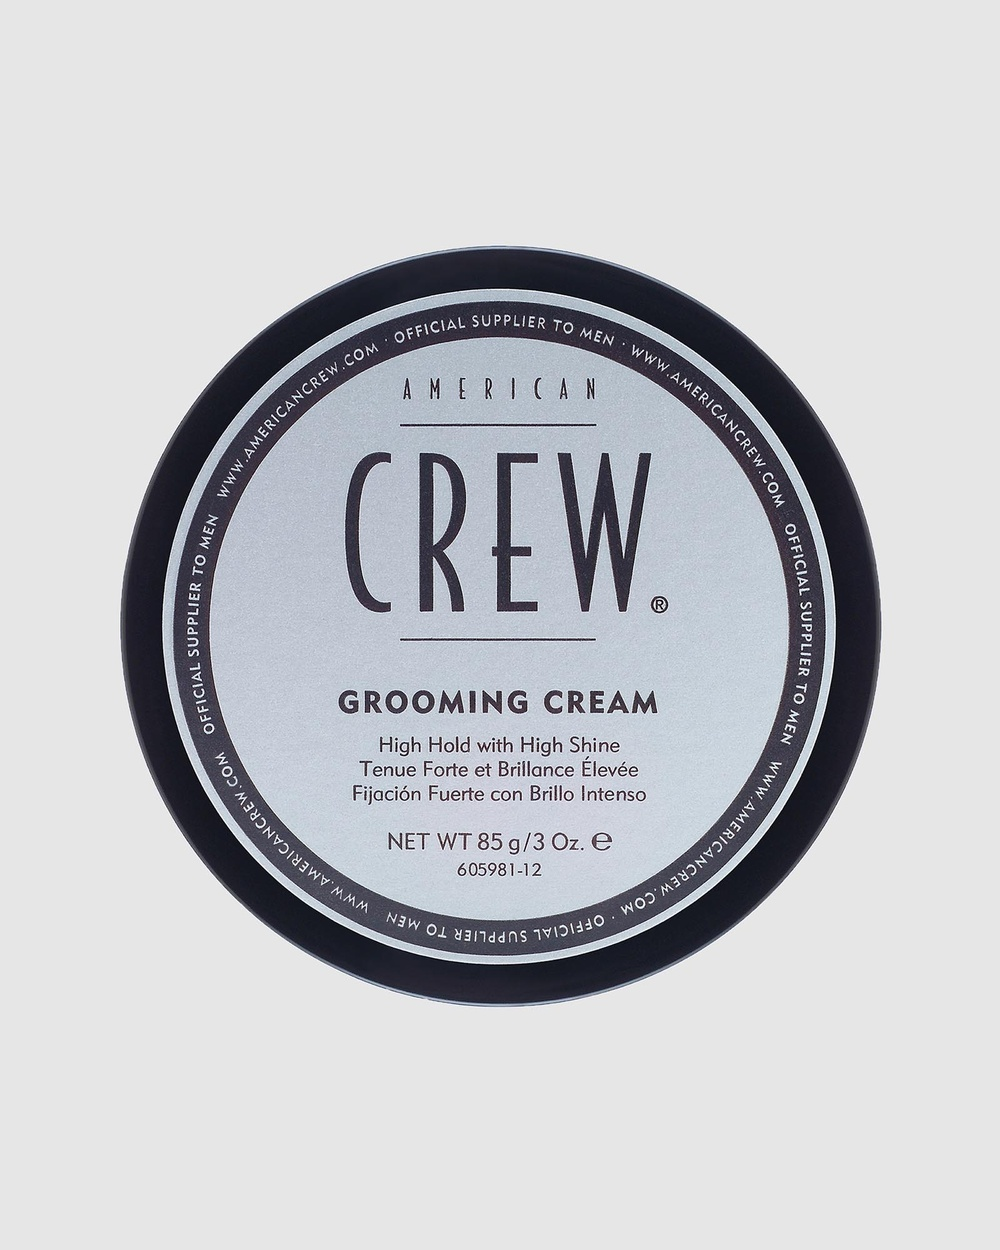 American Crew Classic Grooming Cream 3oz 85g Beauty N/A 3oz-85g